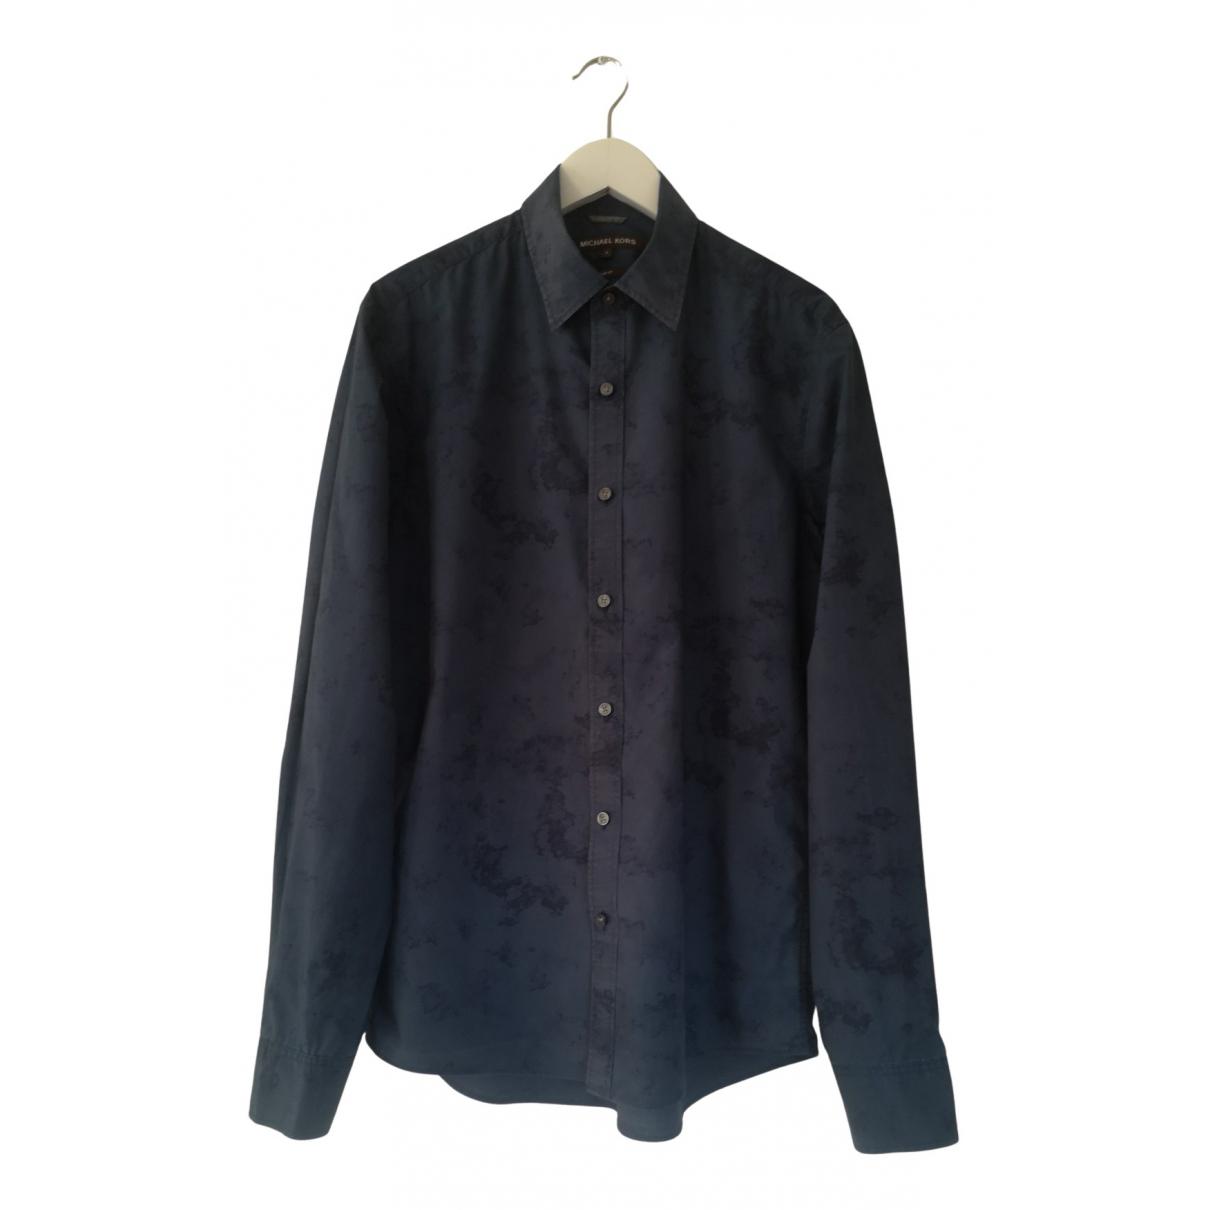 Michael Kors N Navy Cotton Shirts for Men M International